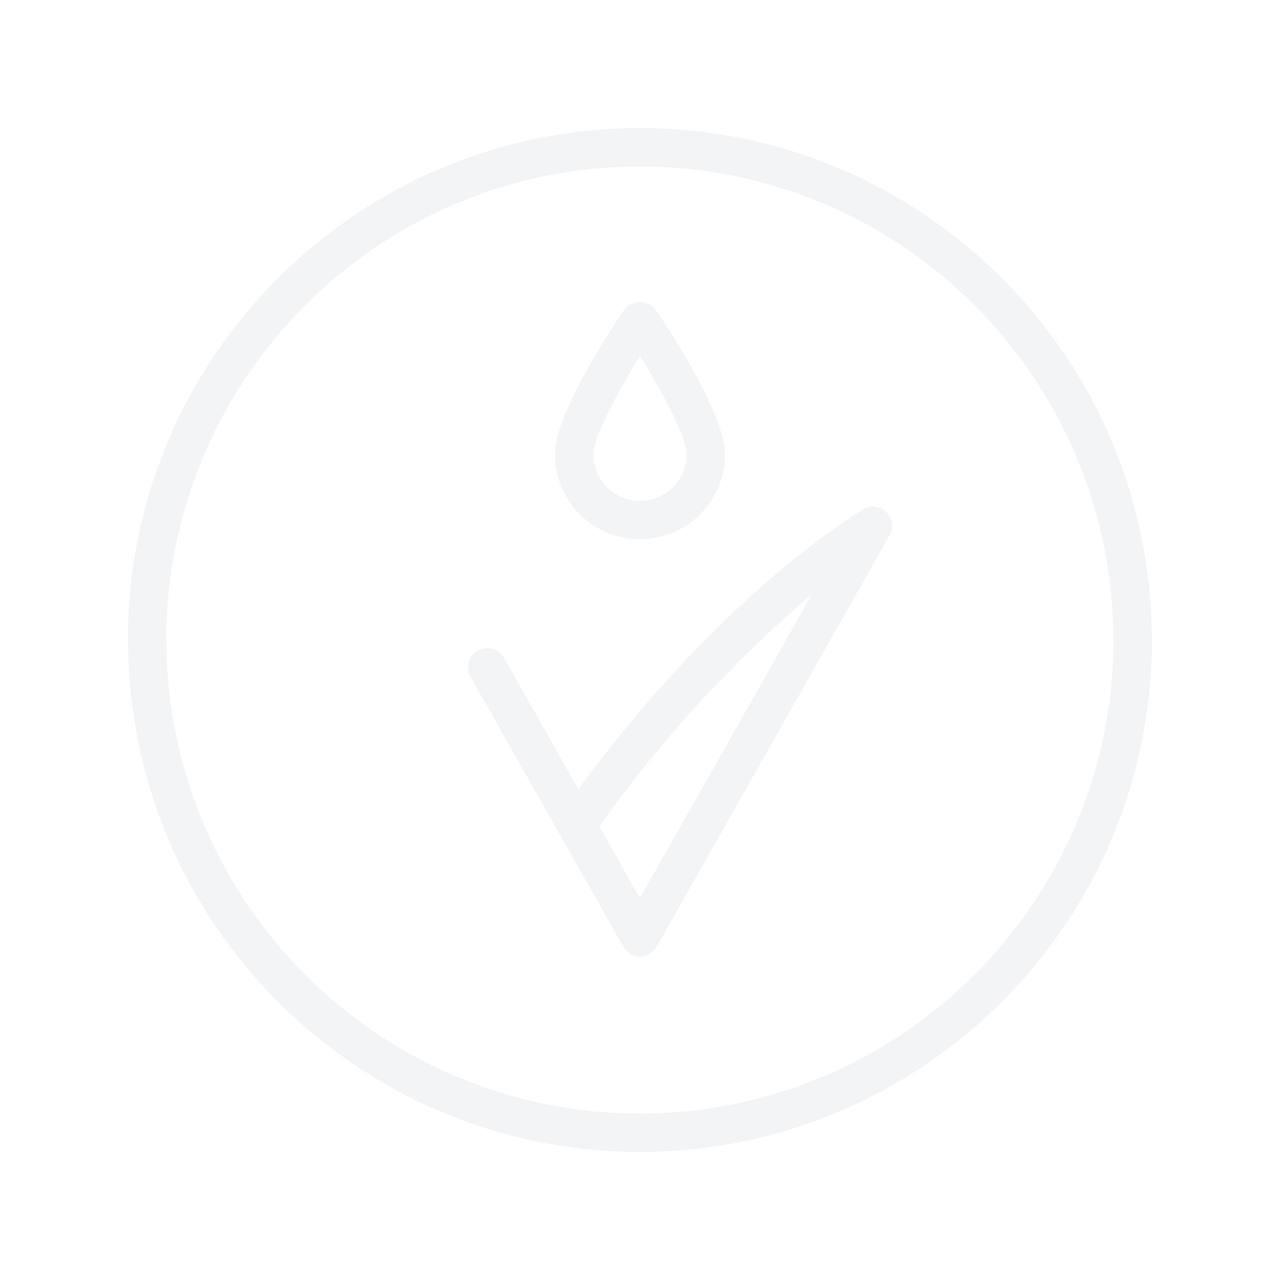 DR. BRONNERS Almond Pure Castile Soap